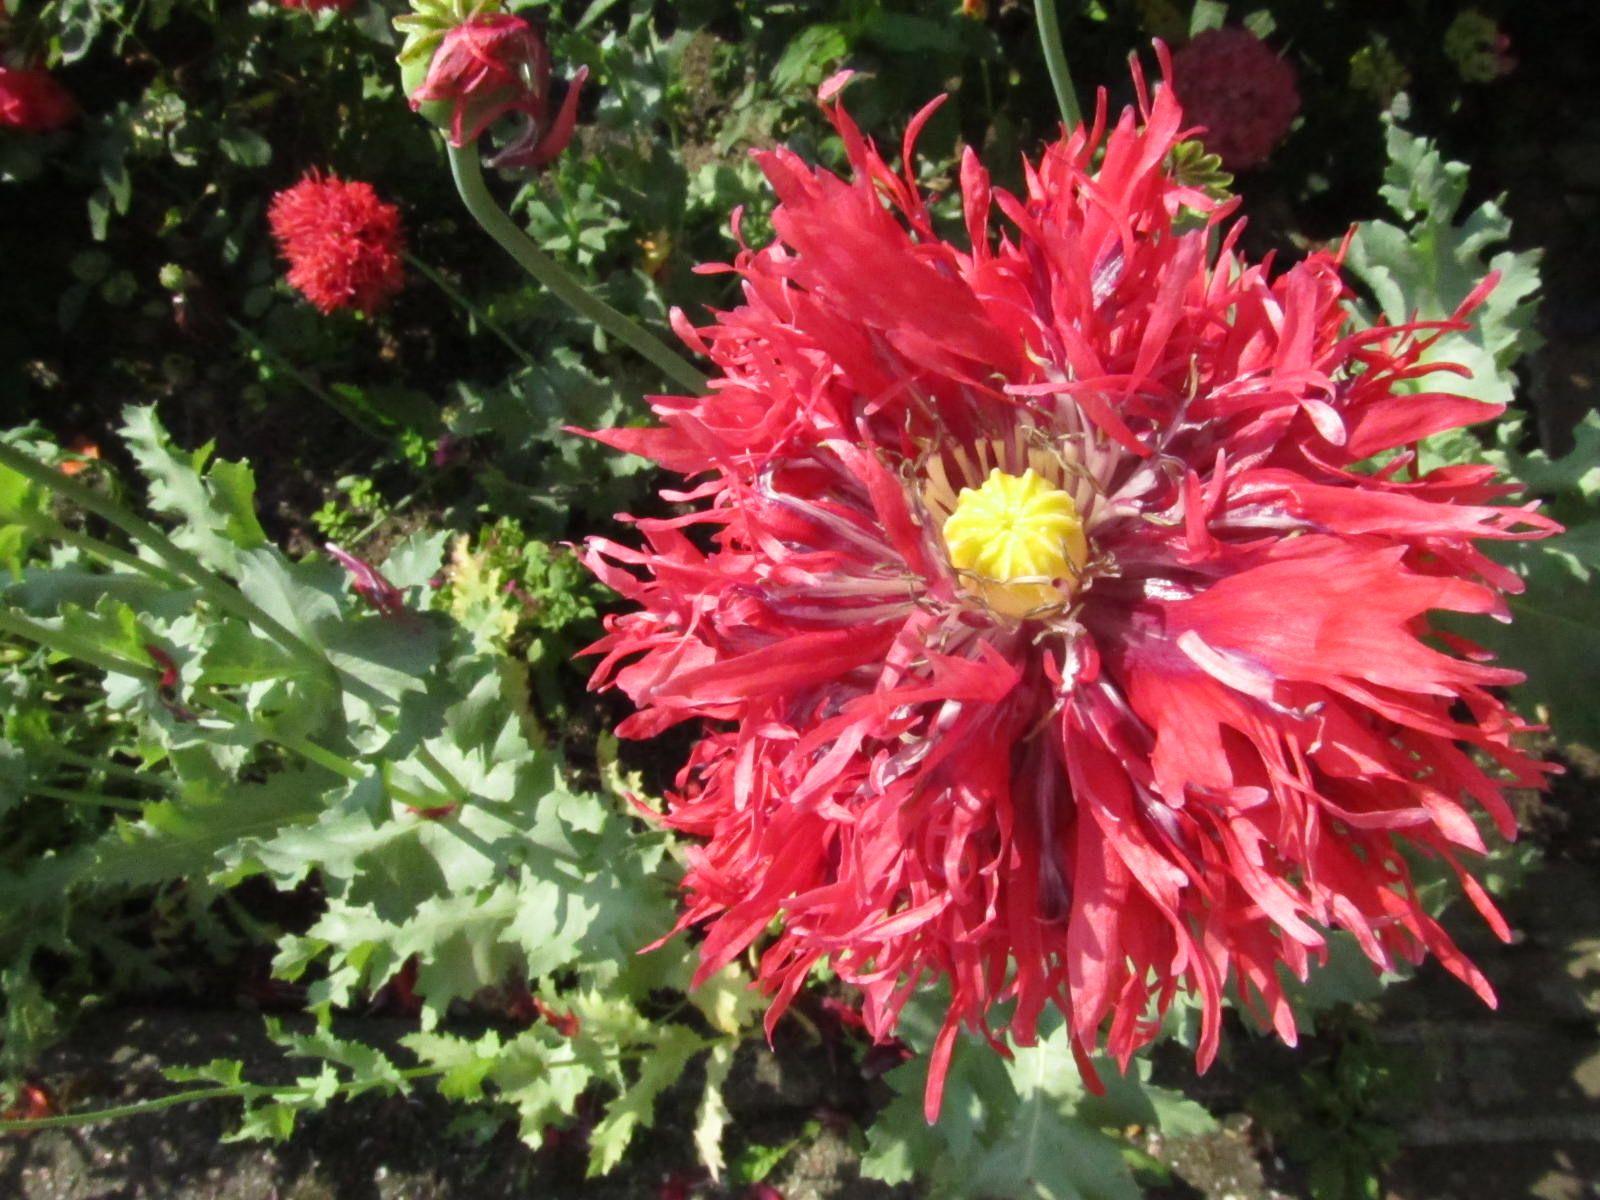 Moonflower poppies